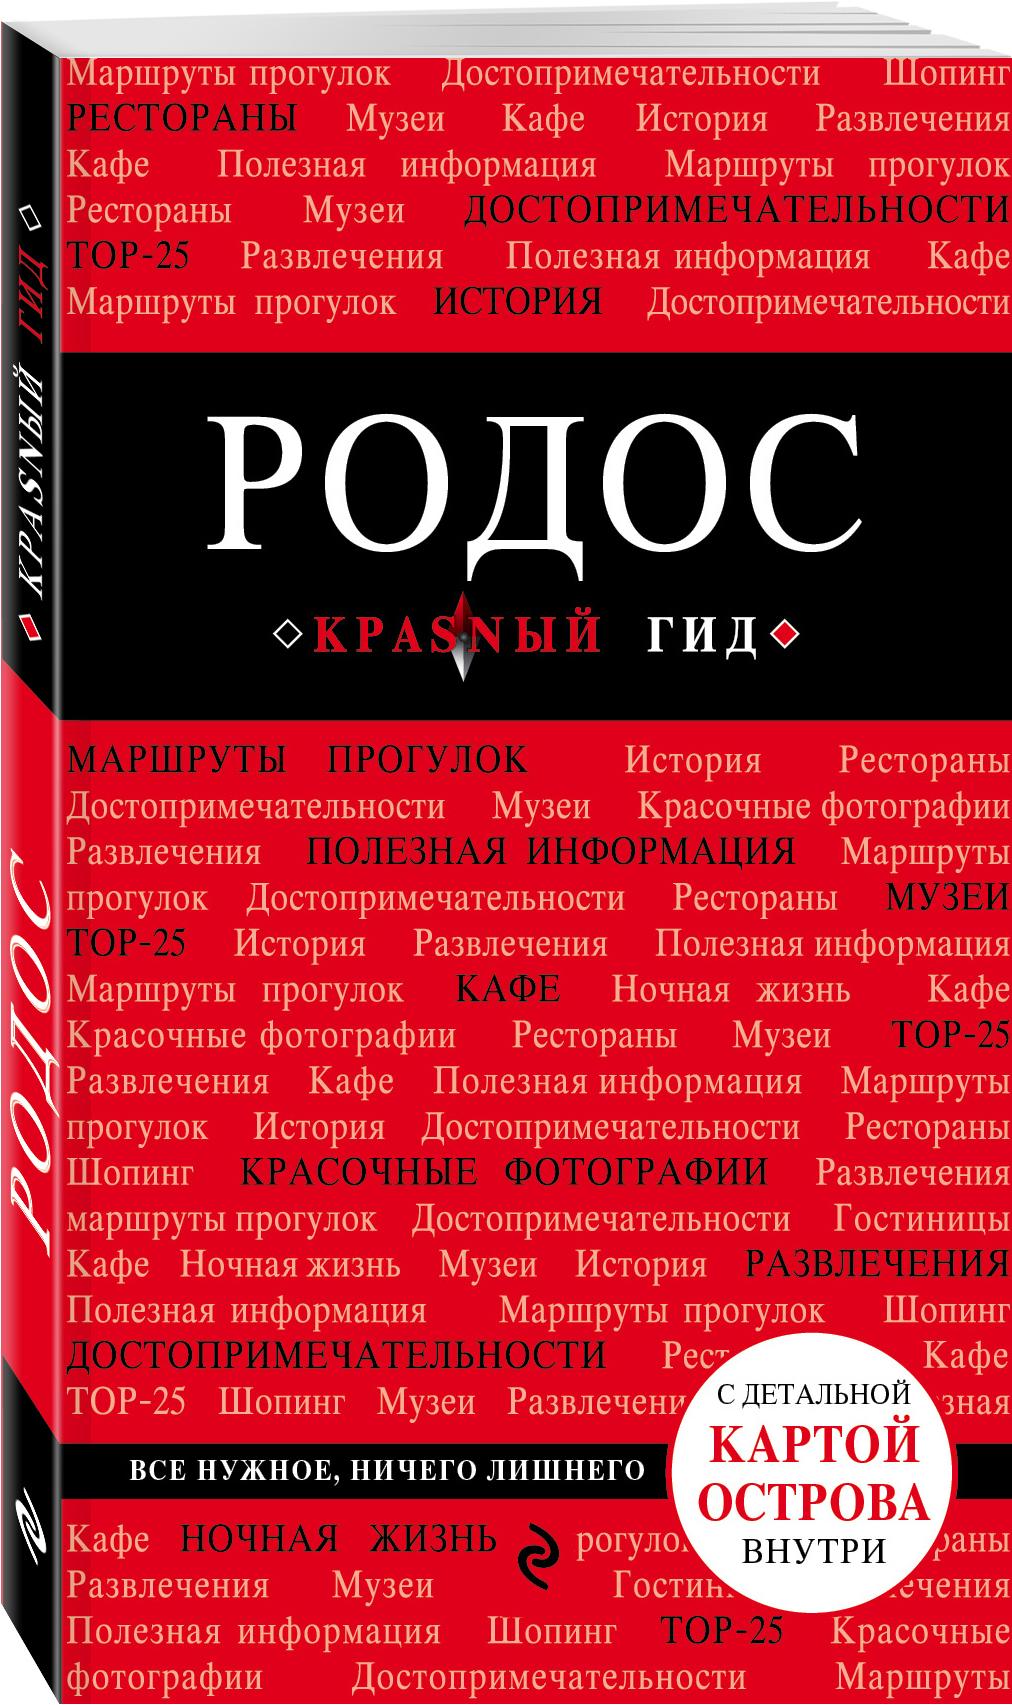 цена Анна Киберева Родос. 4-е изд., испр. и доп.